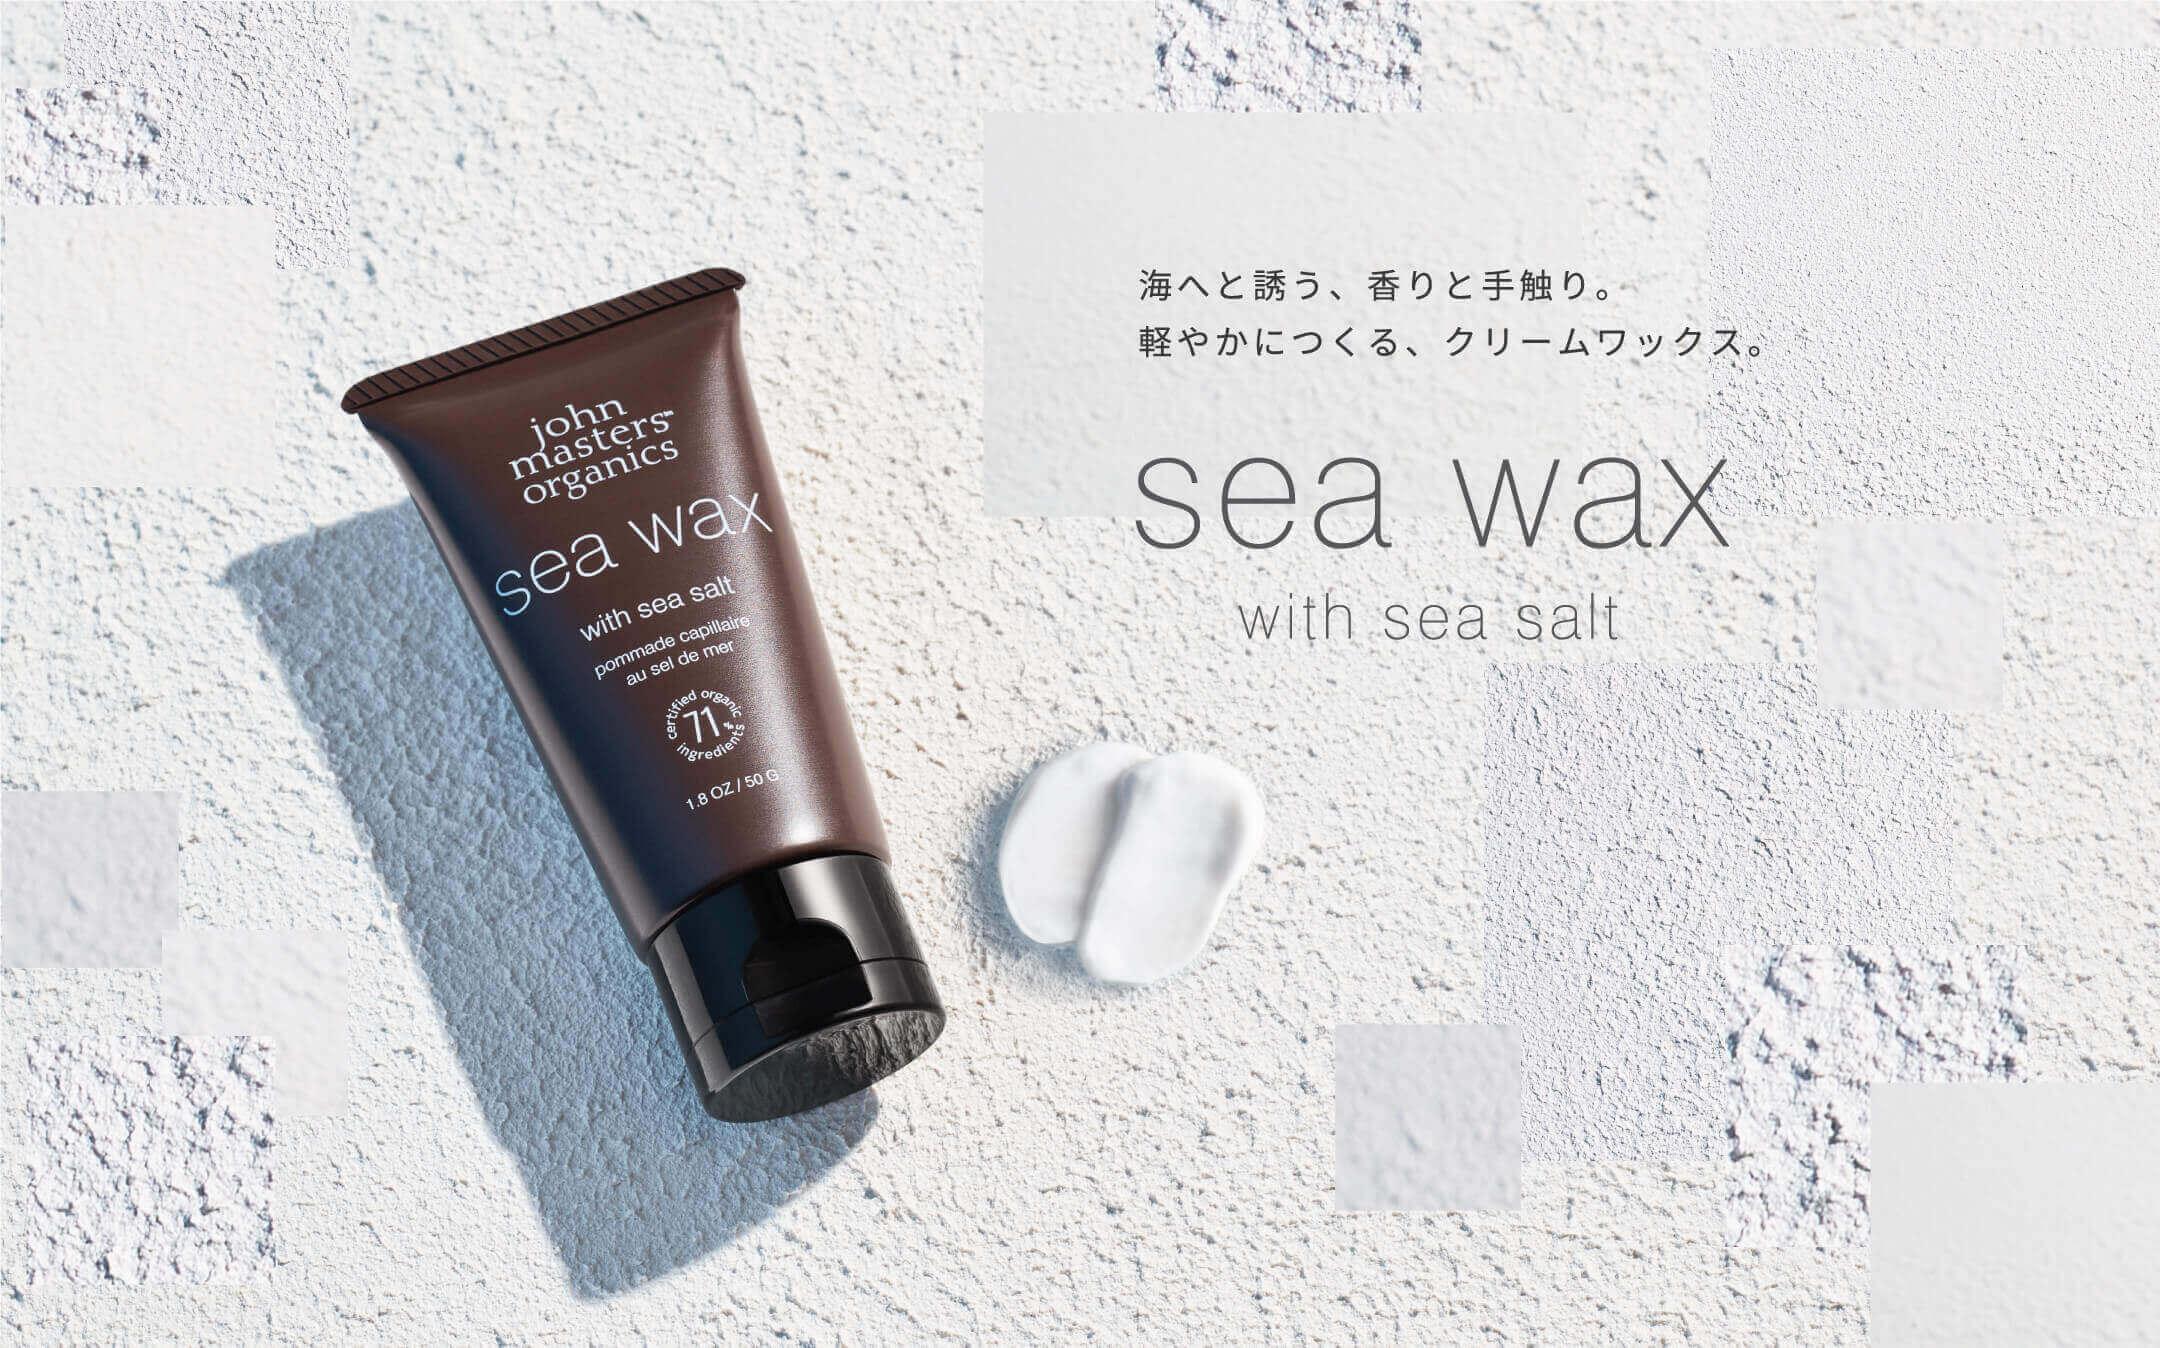 SeaWax